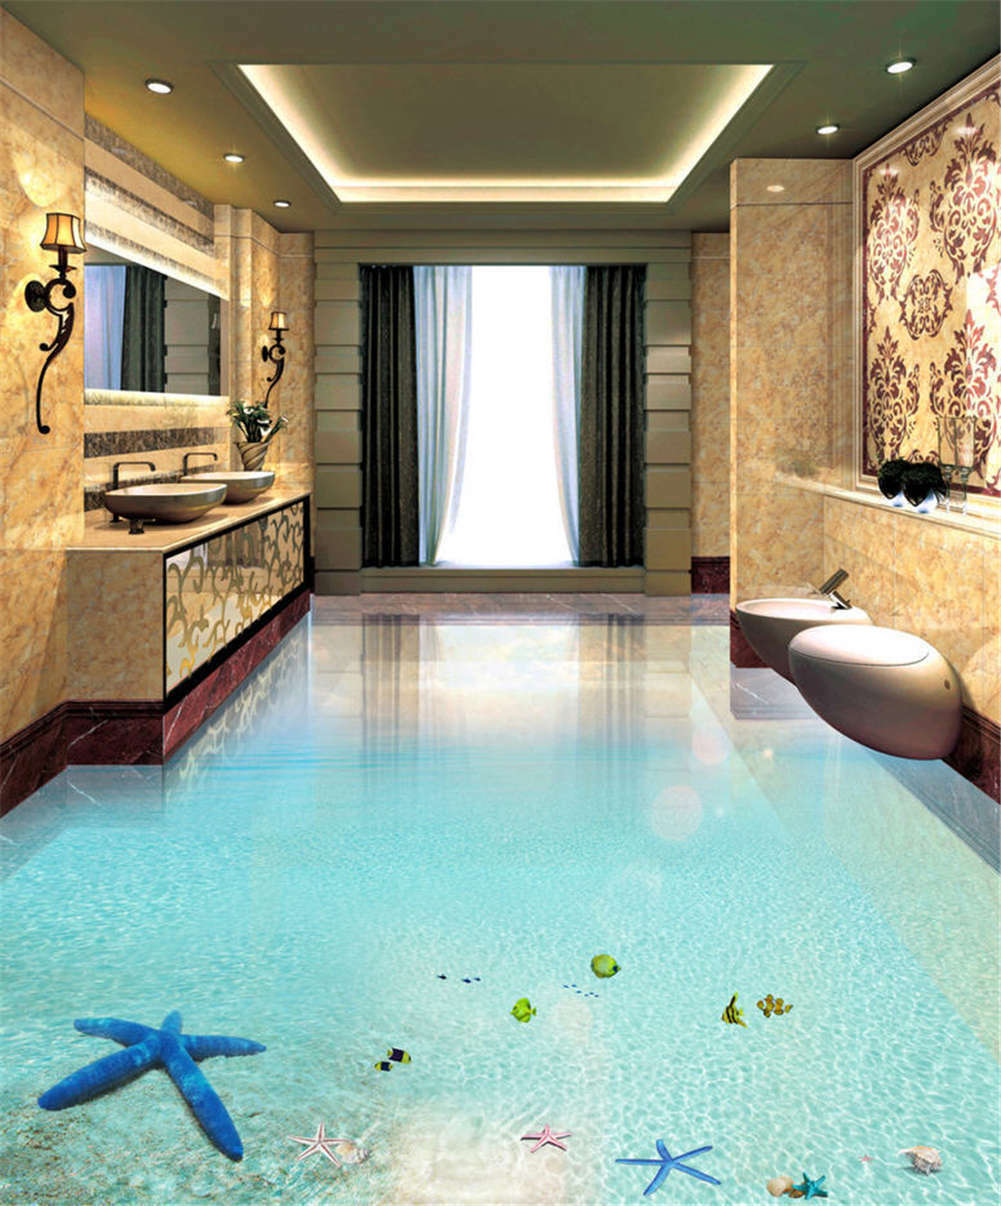 Amiable Blau Water 3D Floor Mural Photo Flooring Wallpaper Home Print Decoration